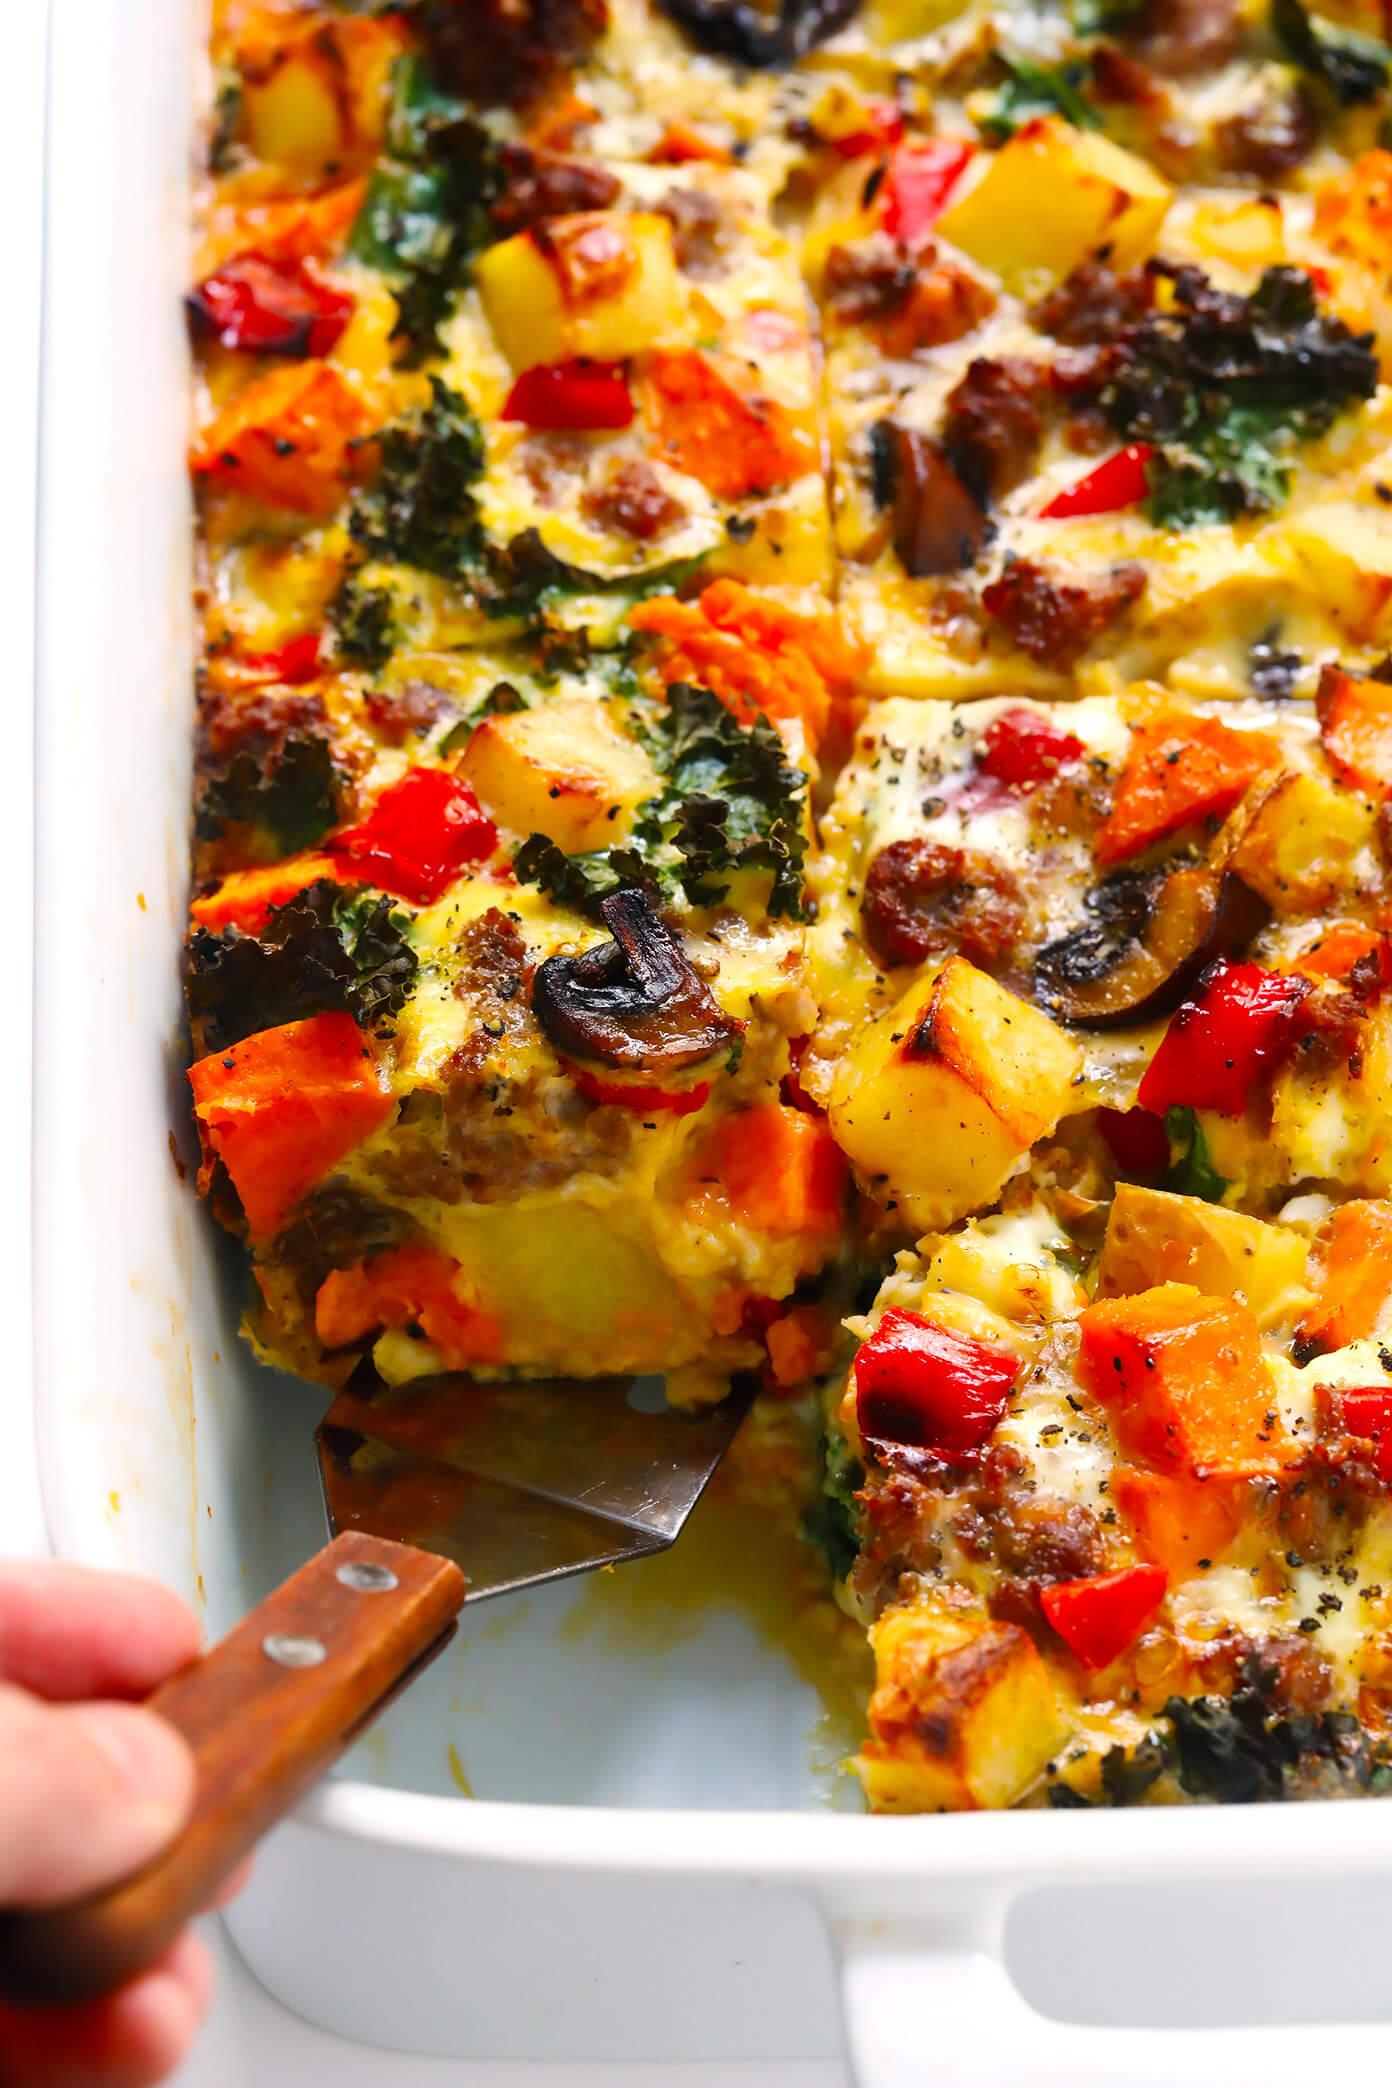 Cozy Autumn Breakfast Casserole Recipe with Sweet Potato